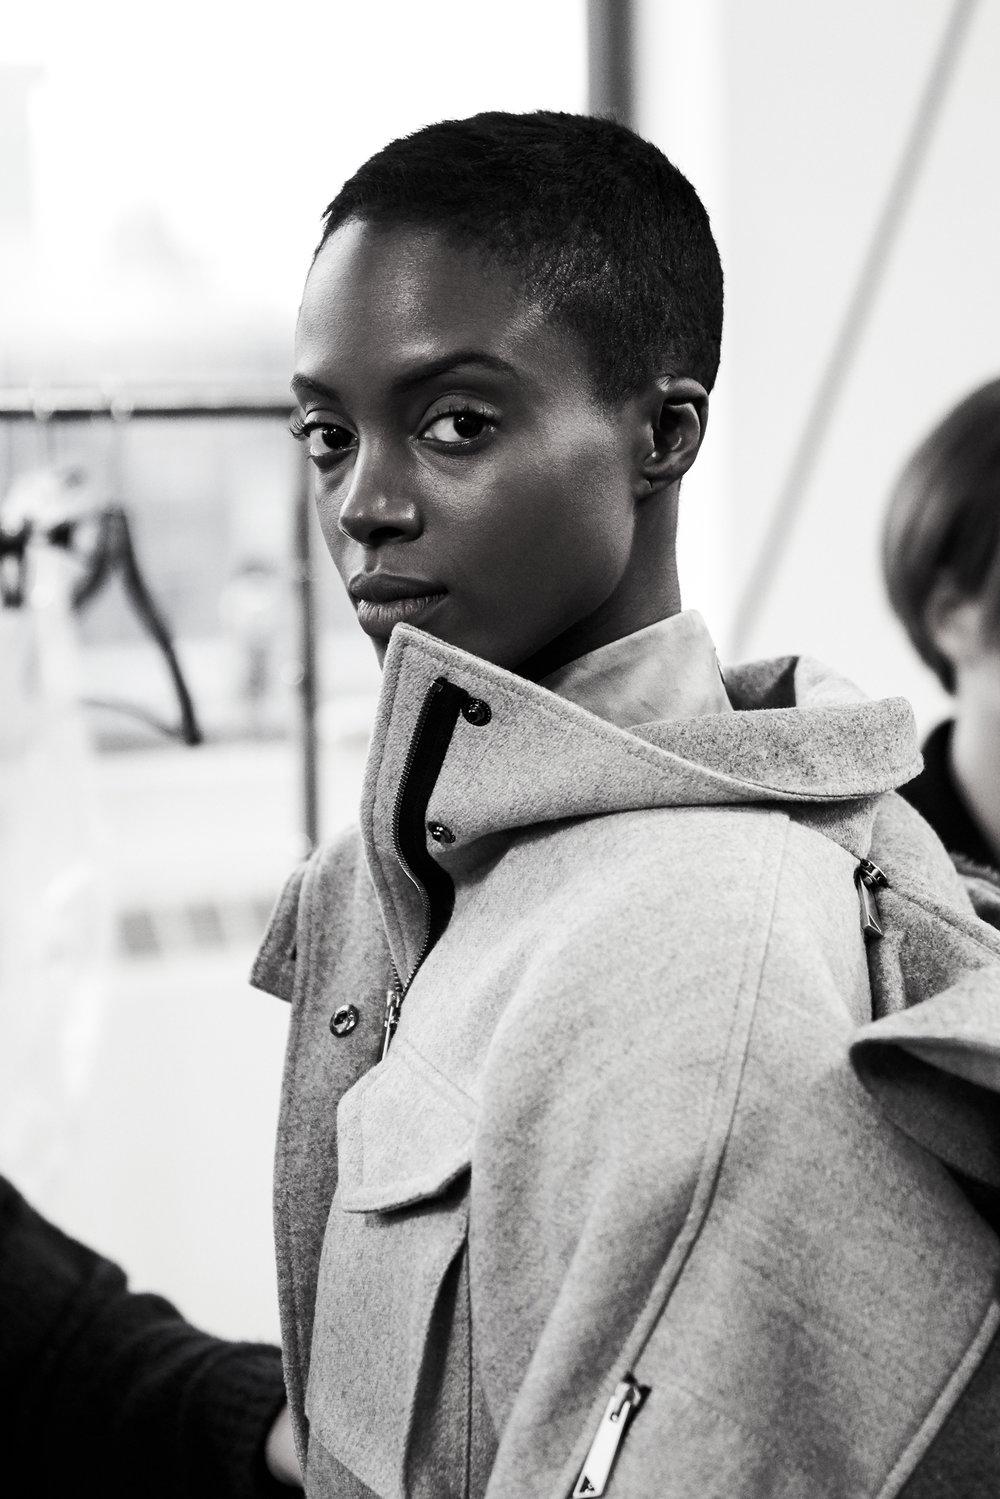 Model Madisin Rian before walking the runway.